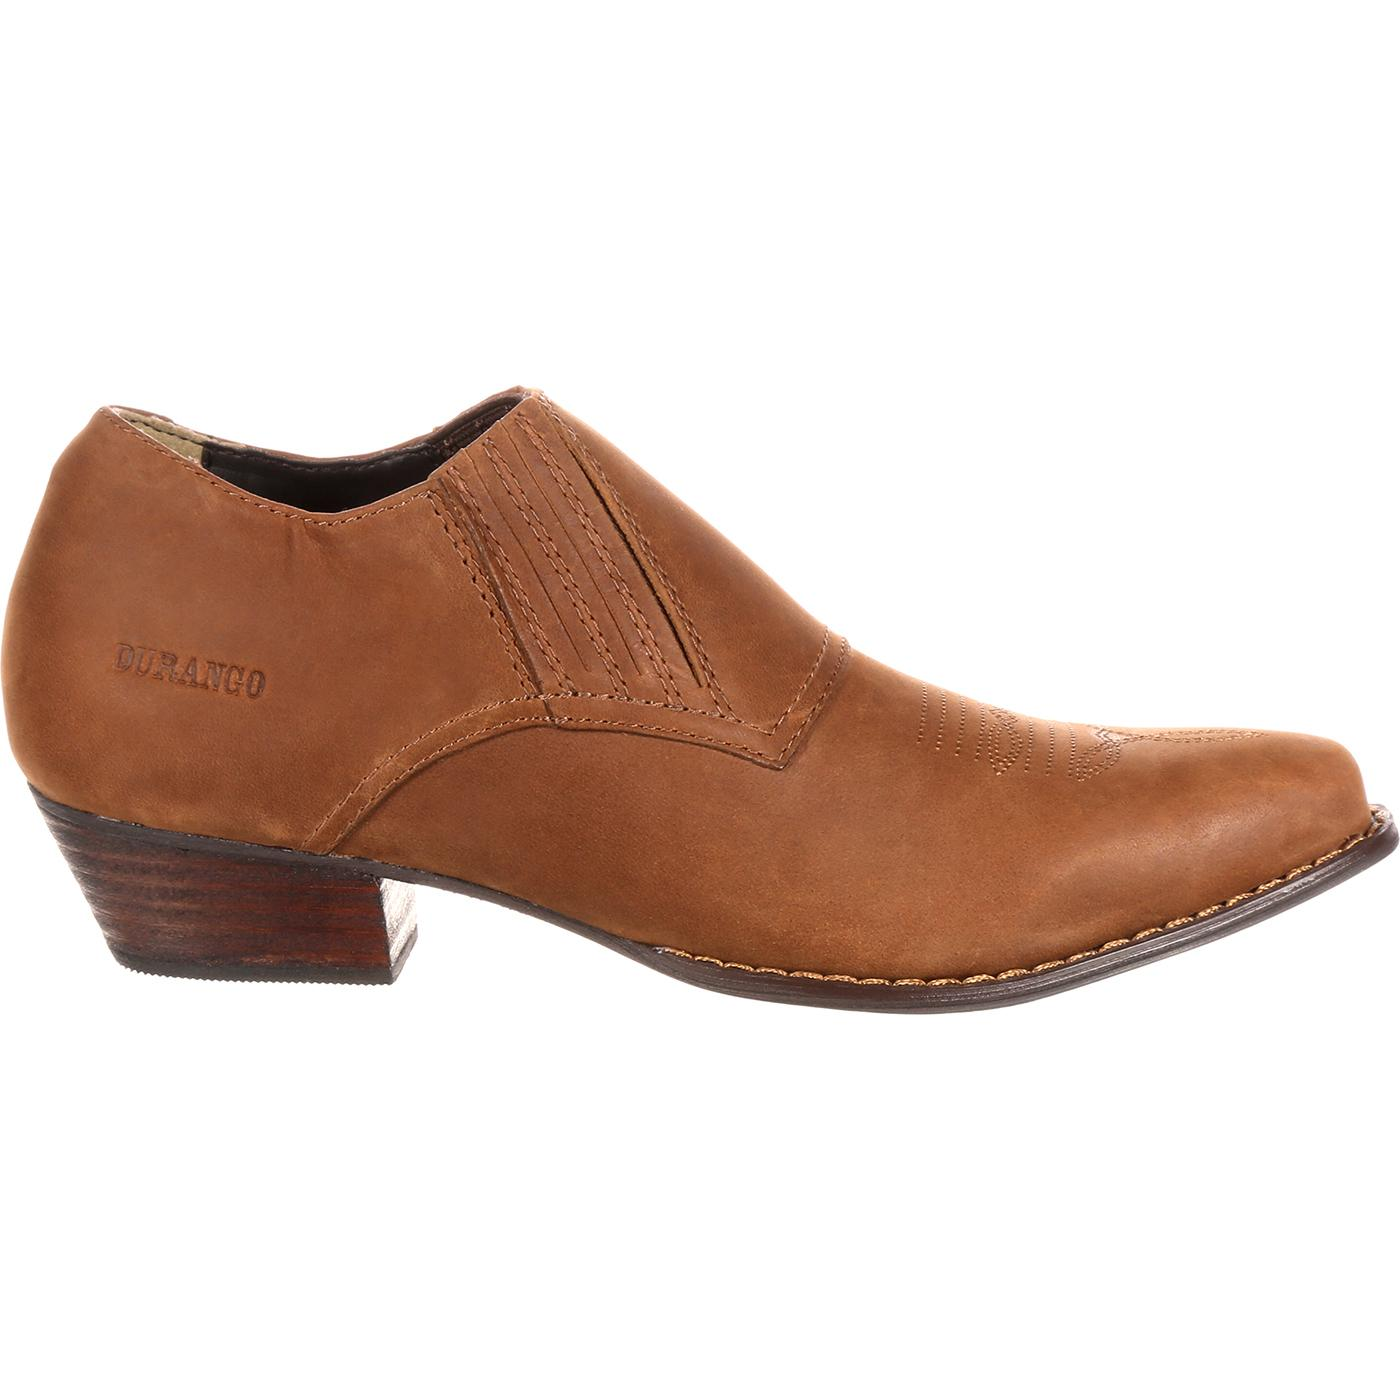 Durango Western Shoe Boot zEelJIaw